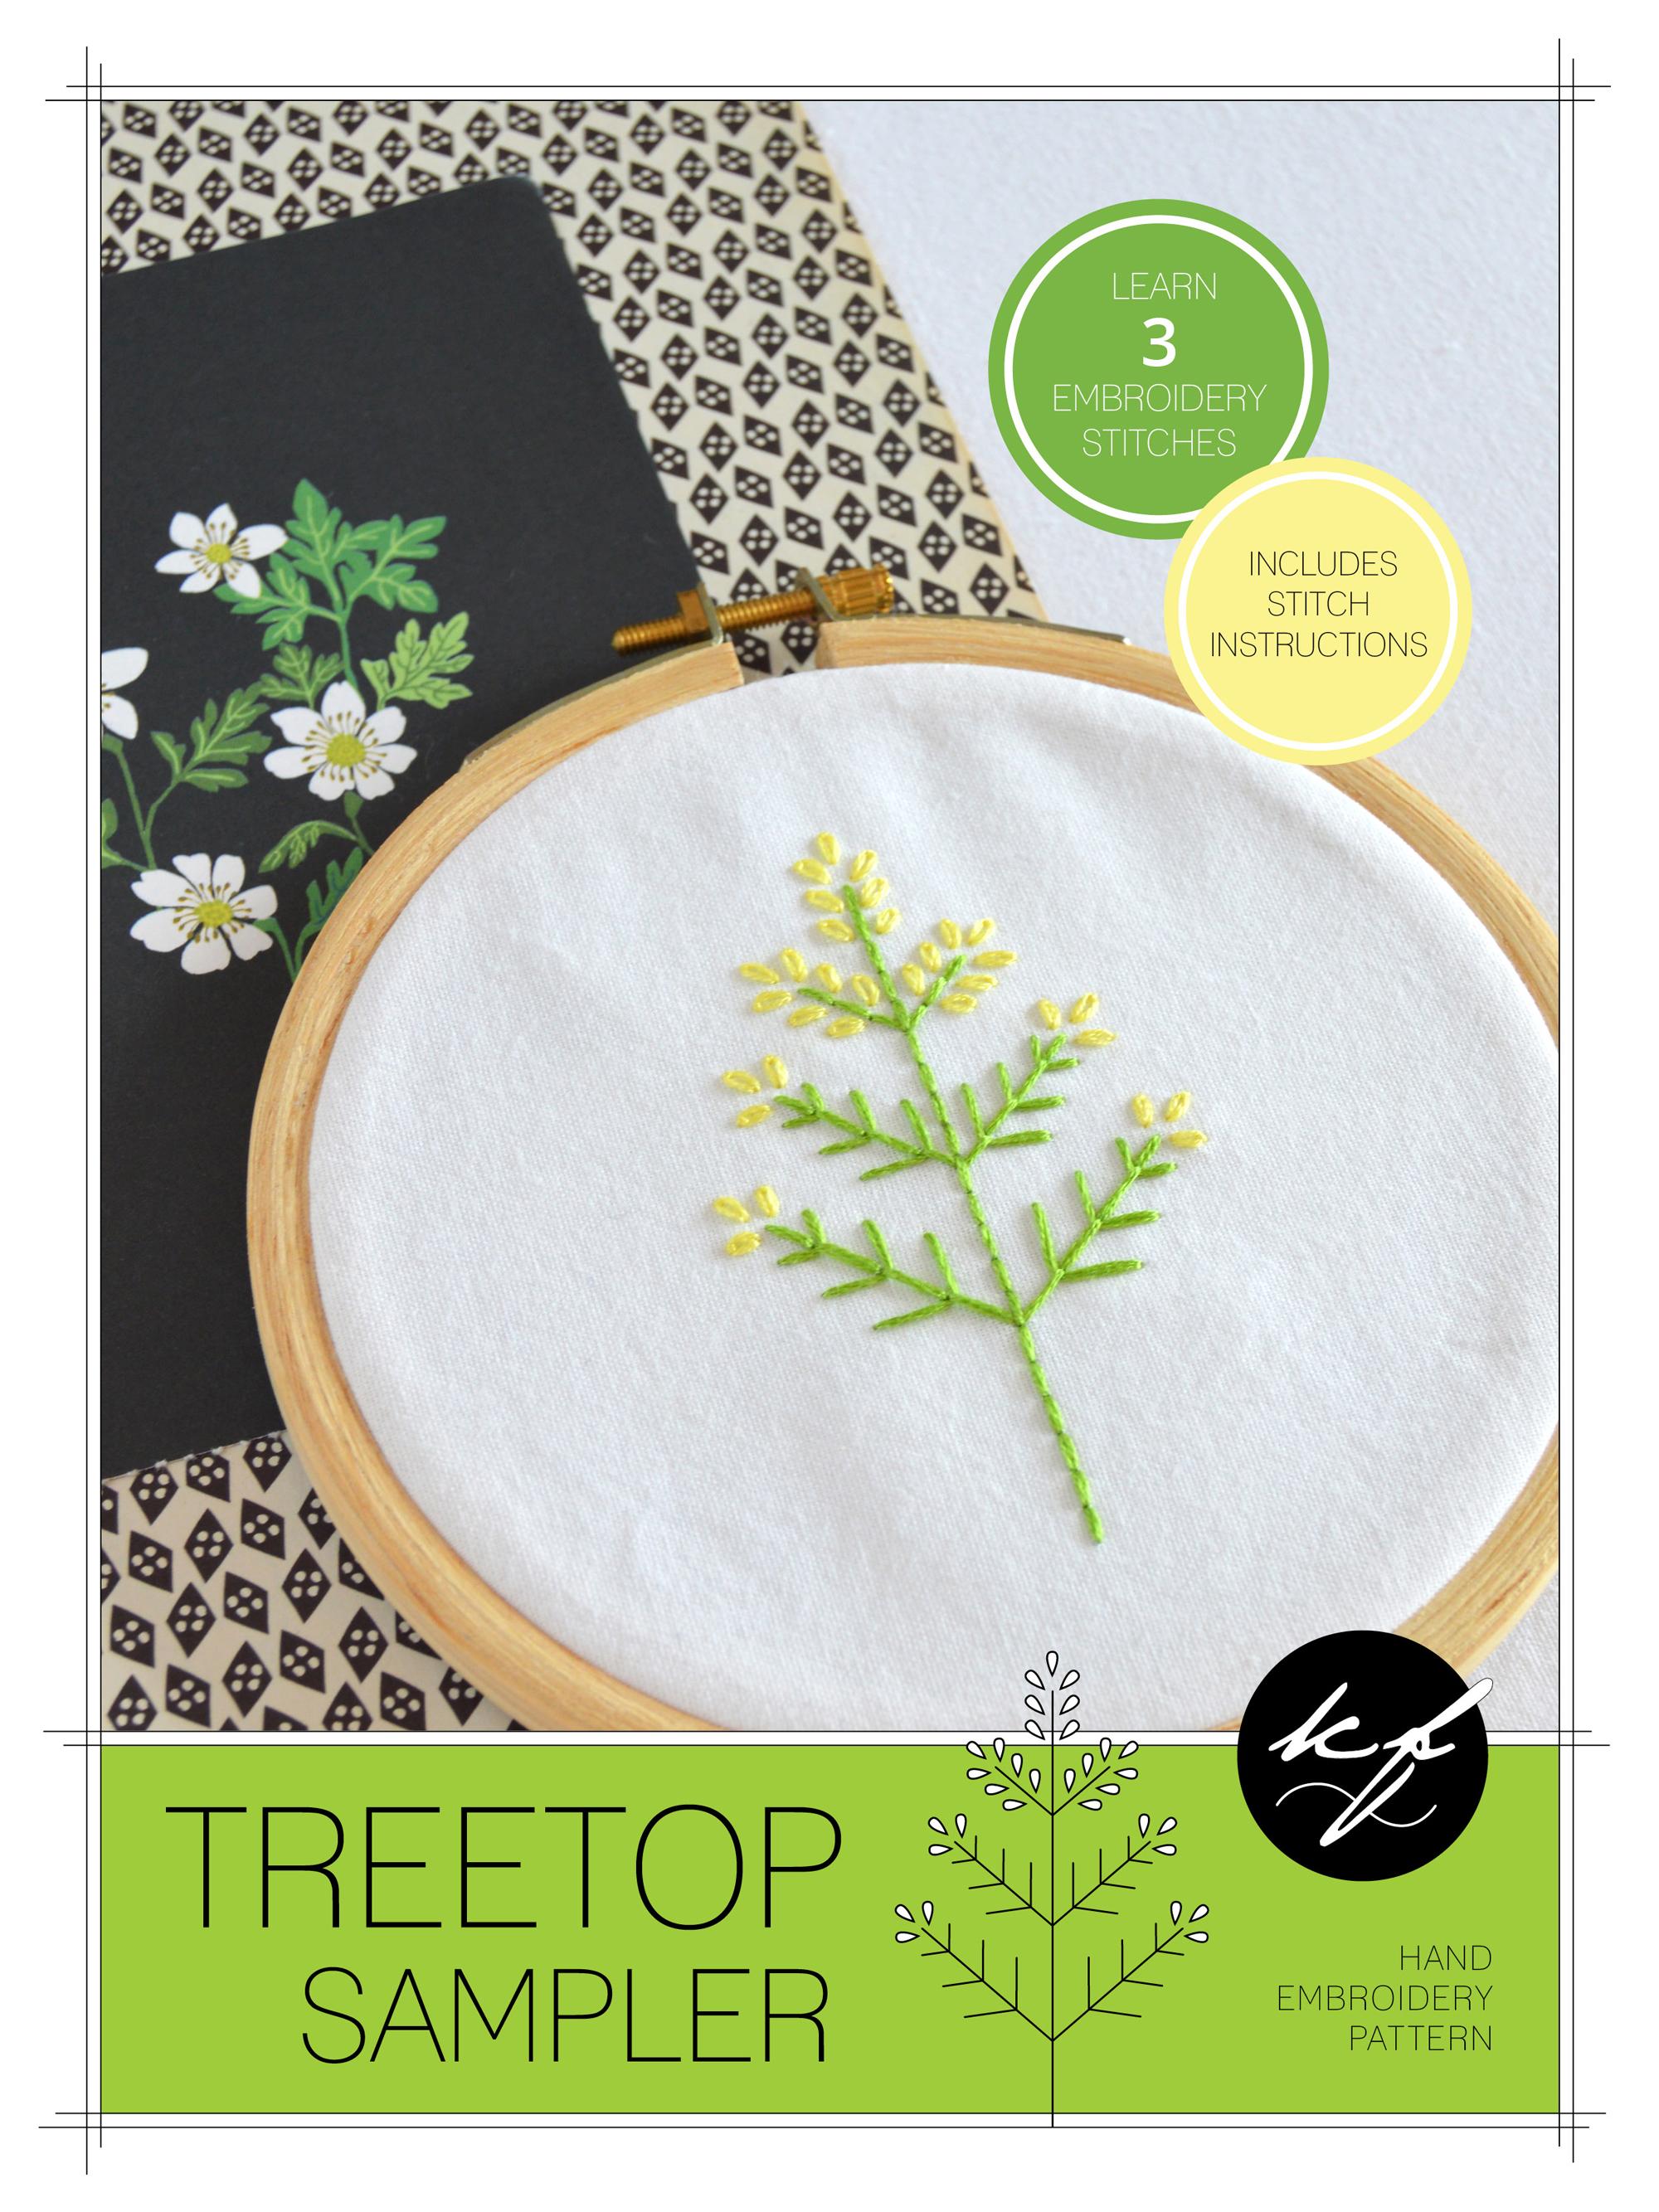 TreetopSamplerEmbroideryPattern_KellyFletcher.jpg